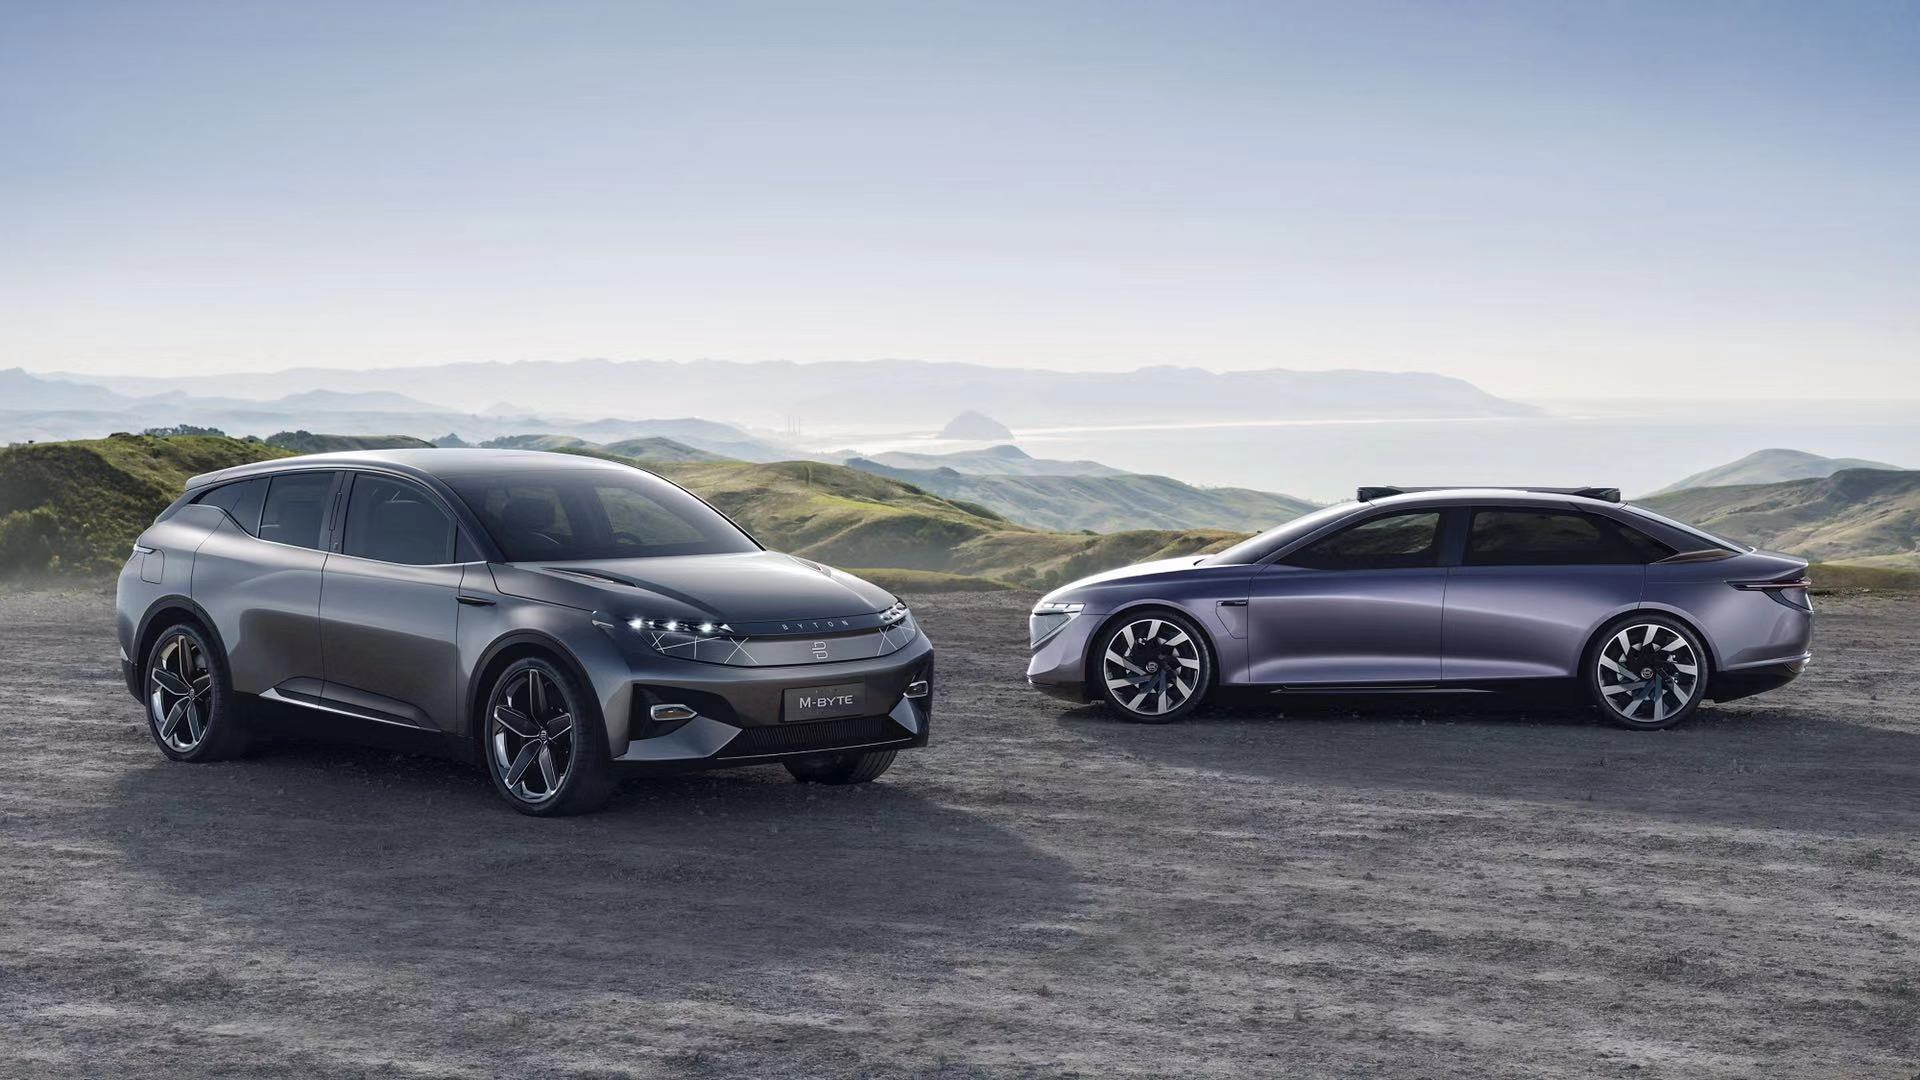 CES 2020:拜腾公布首款量产车北美定价及合作伙伴